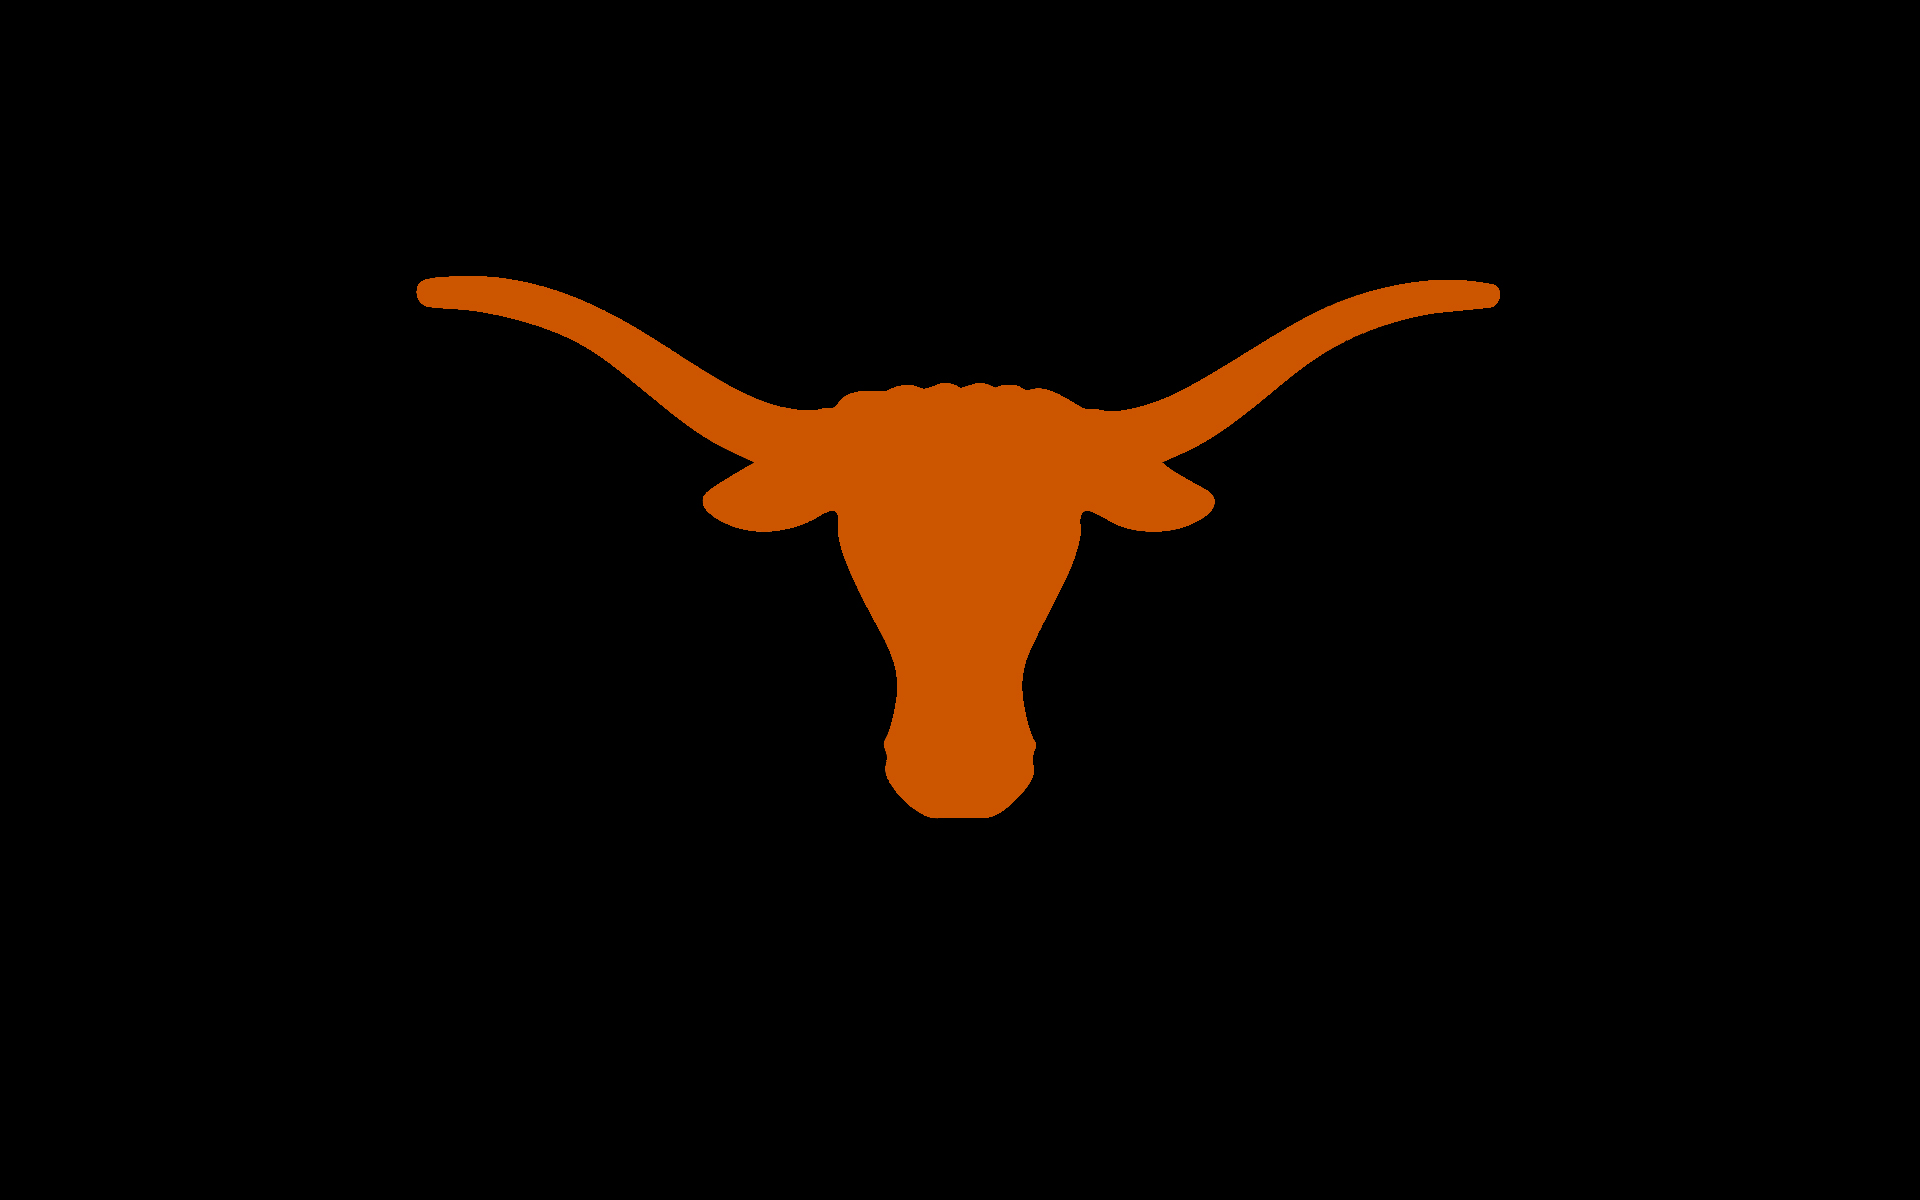 texas longhorns by elite gunnerx on deviantart